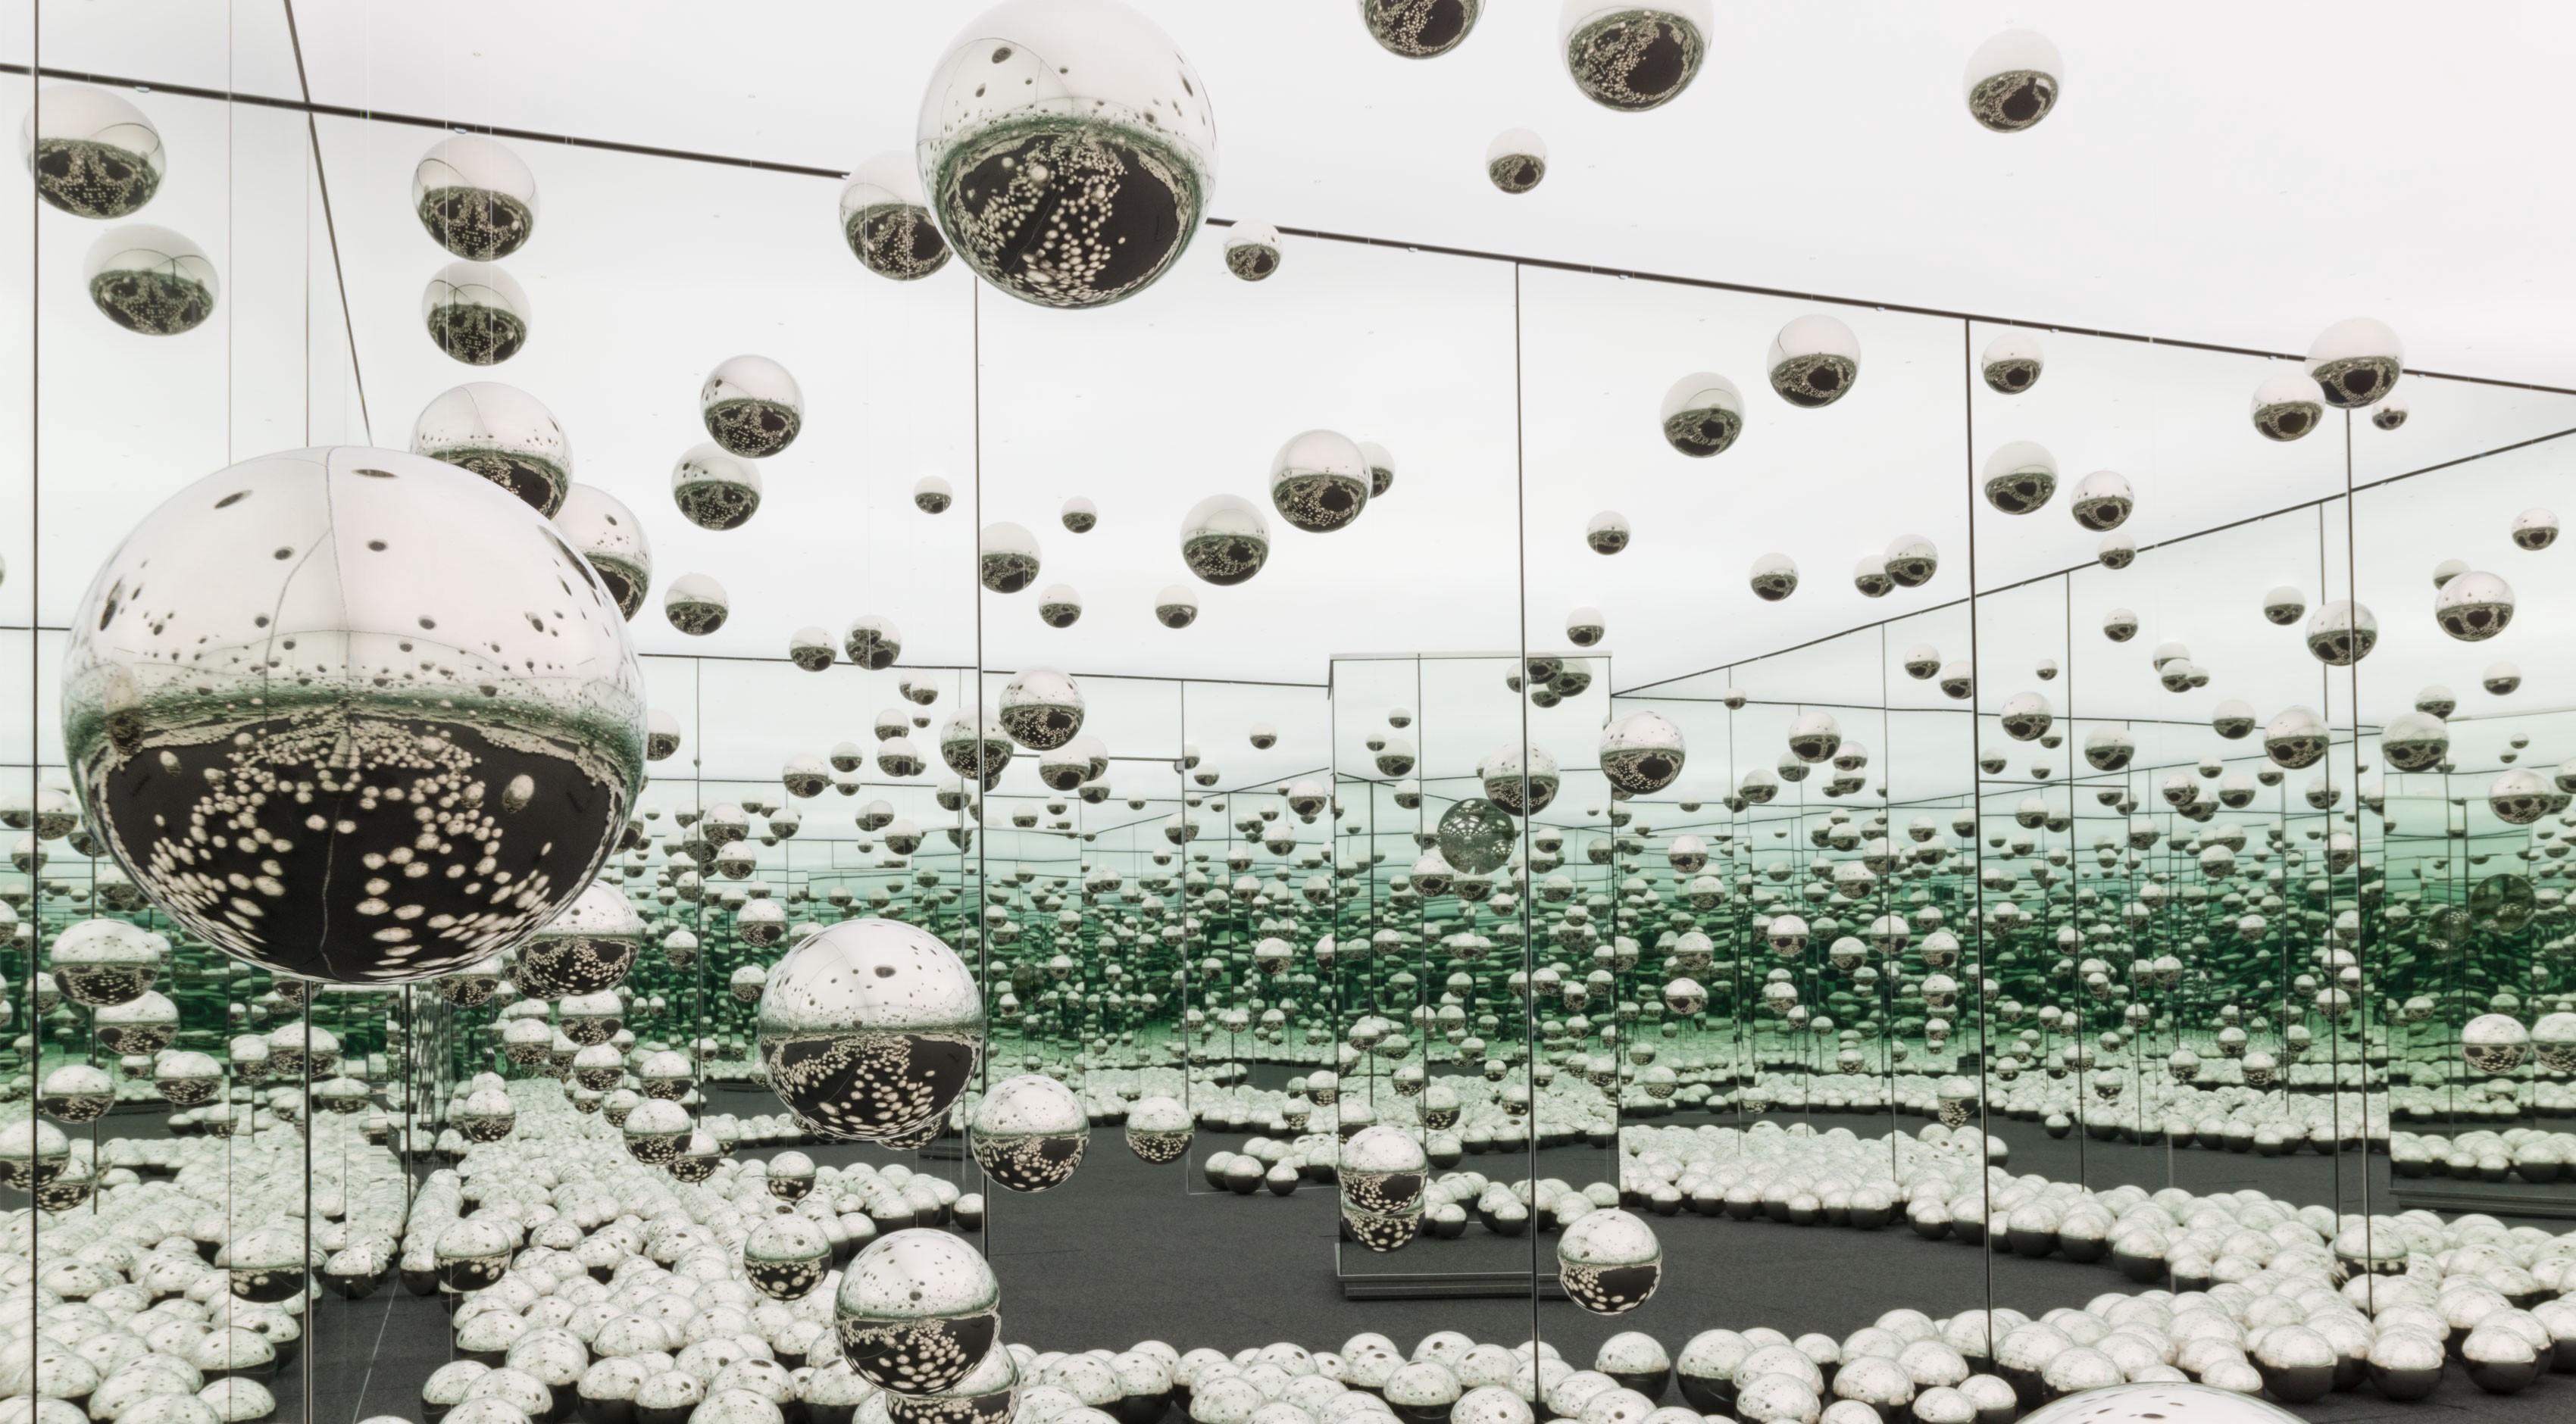 Kusama's Infinity Room exhibition